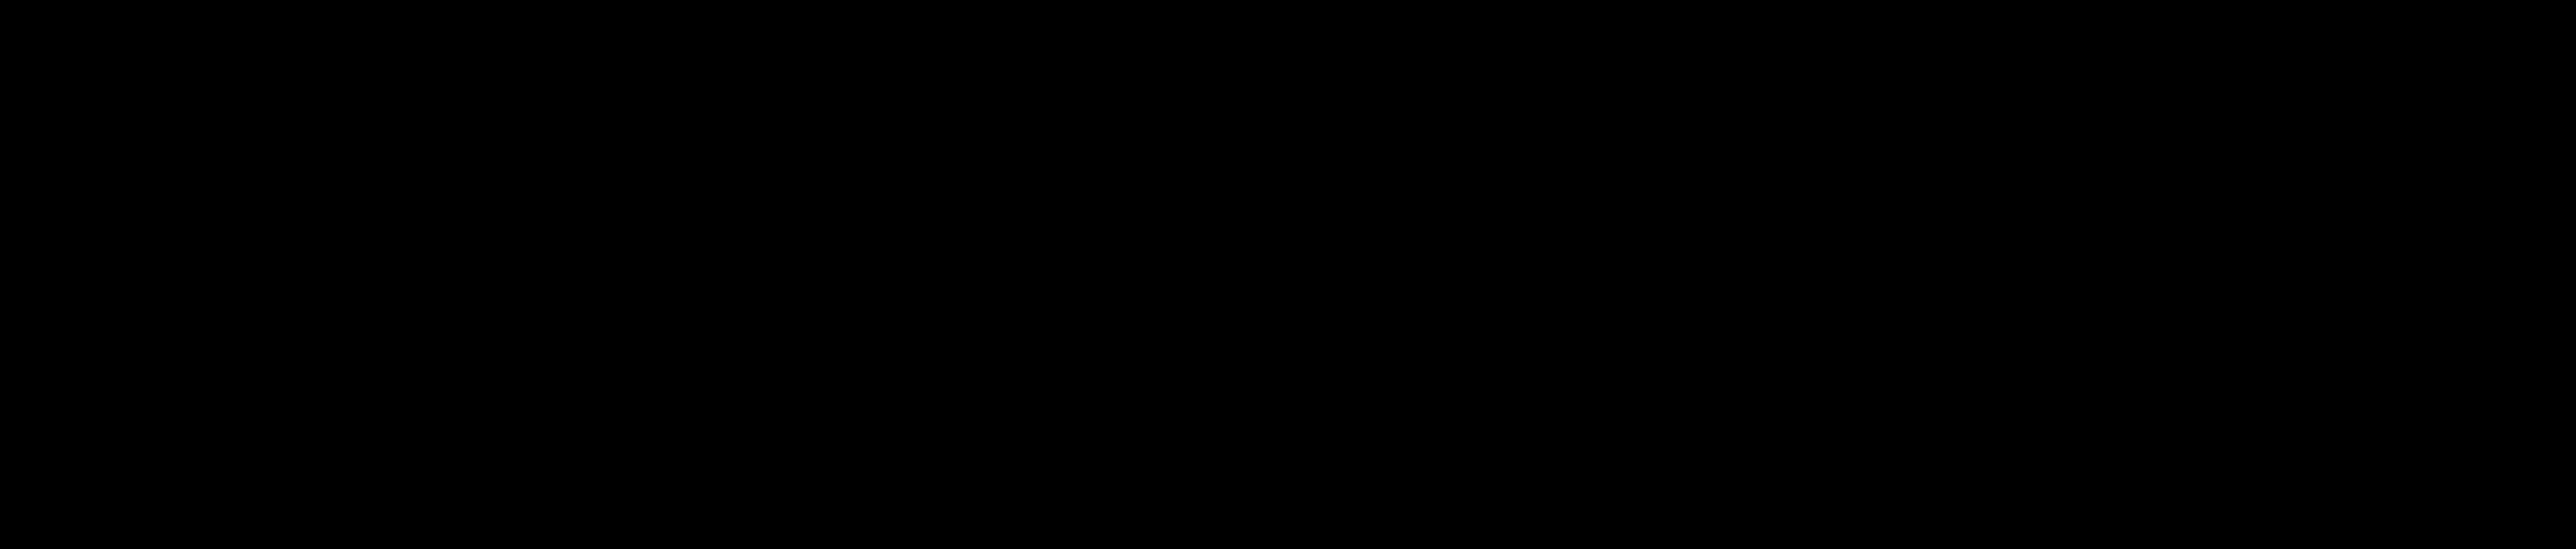 Firma Dra. Ximena